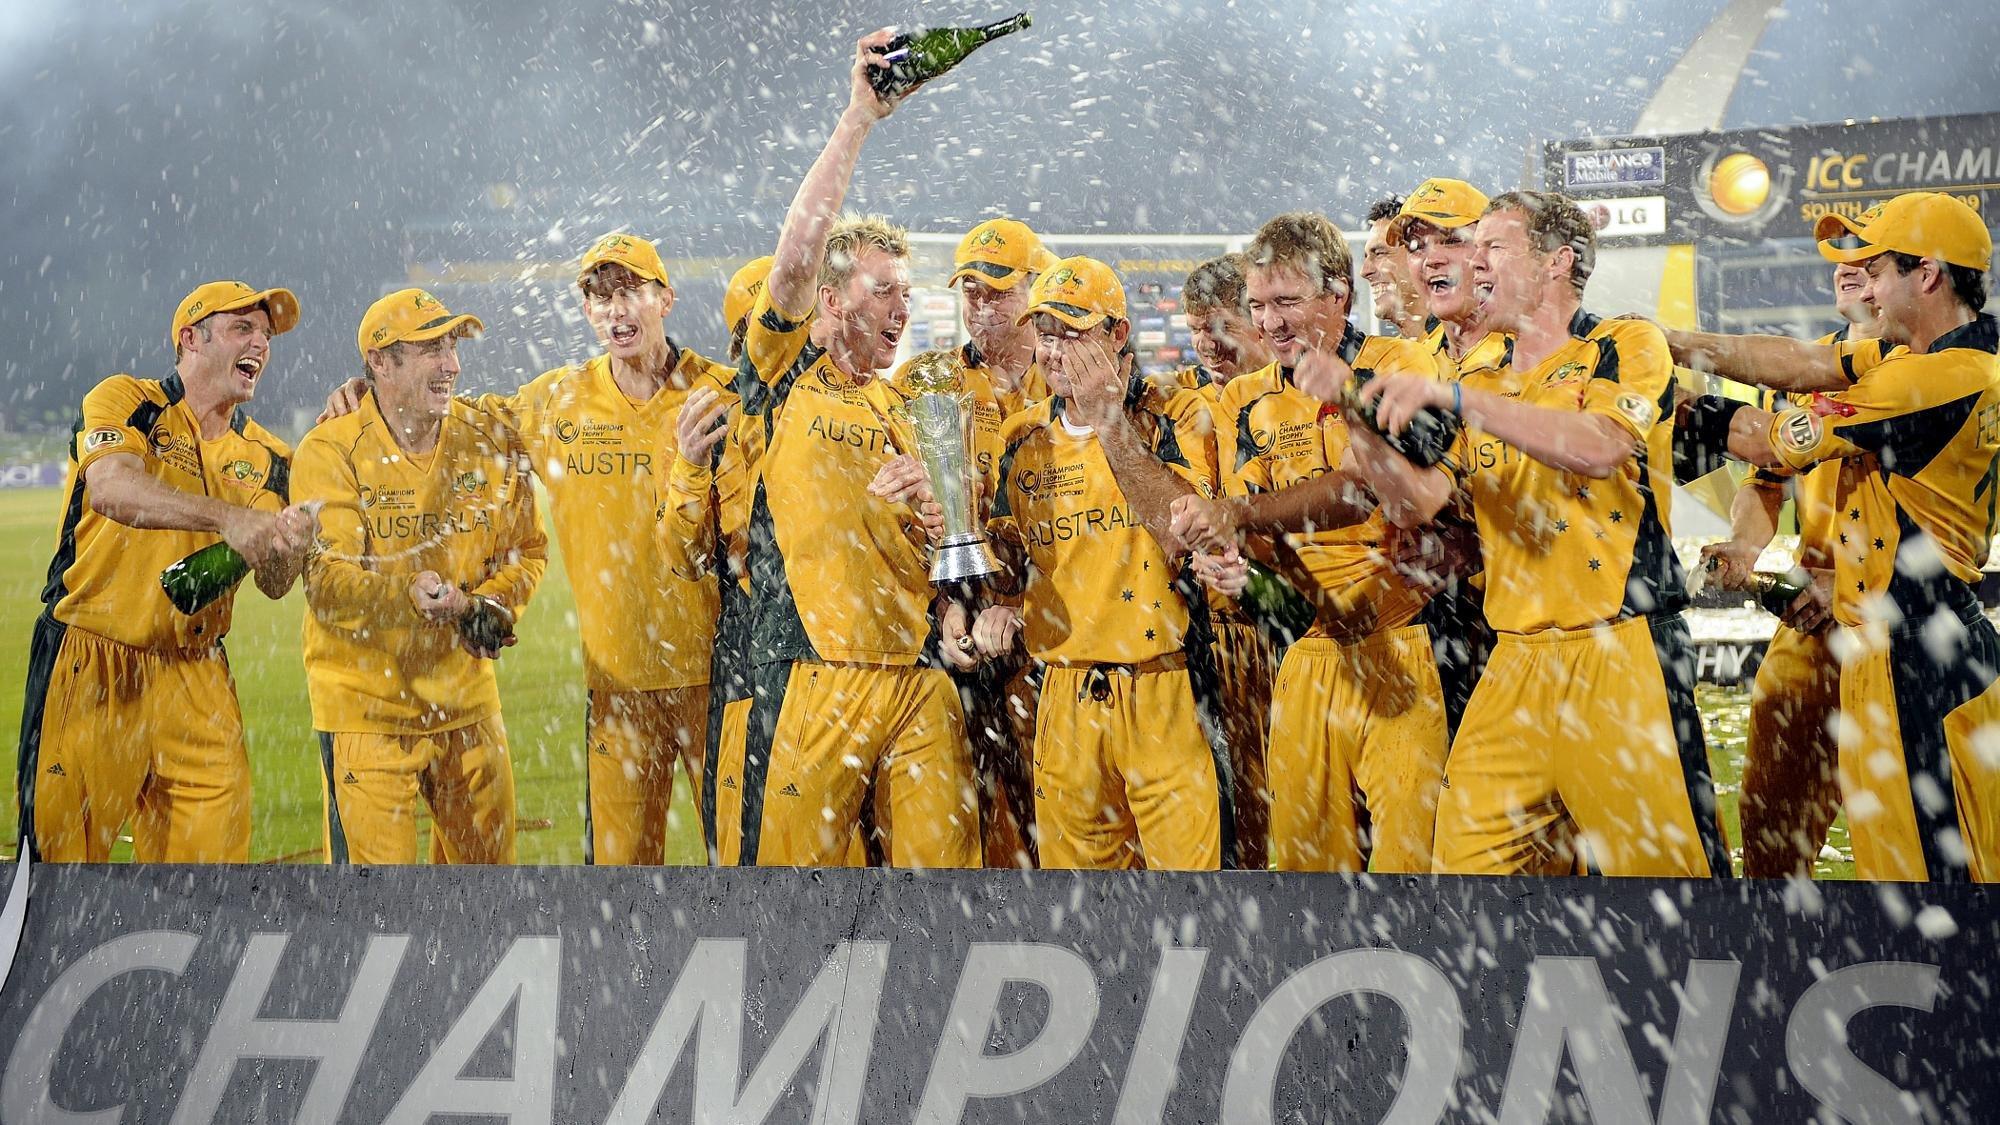 icc-champions-trophy-winners-marathipizza06